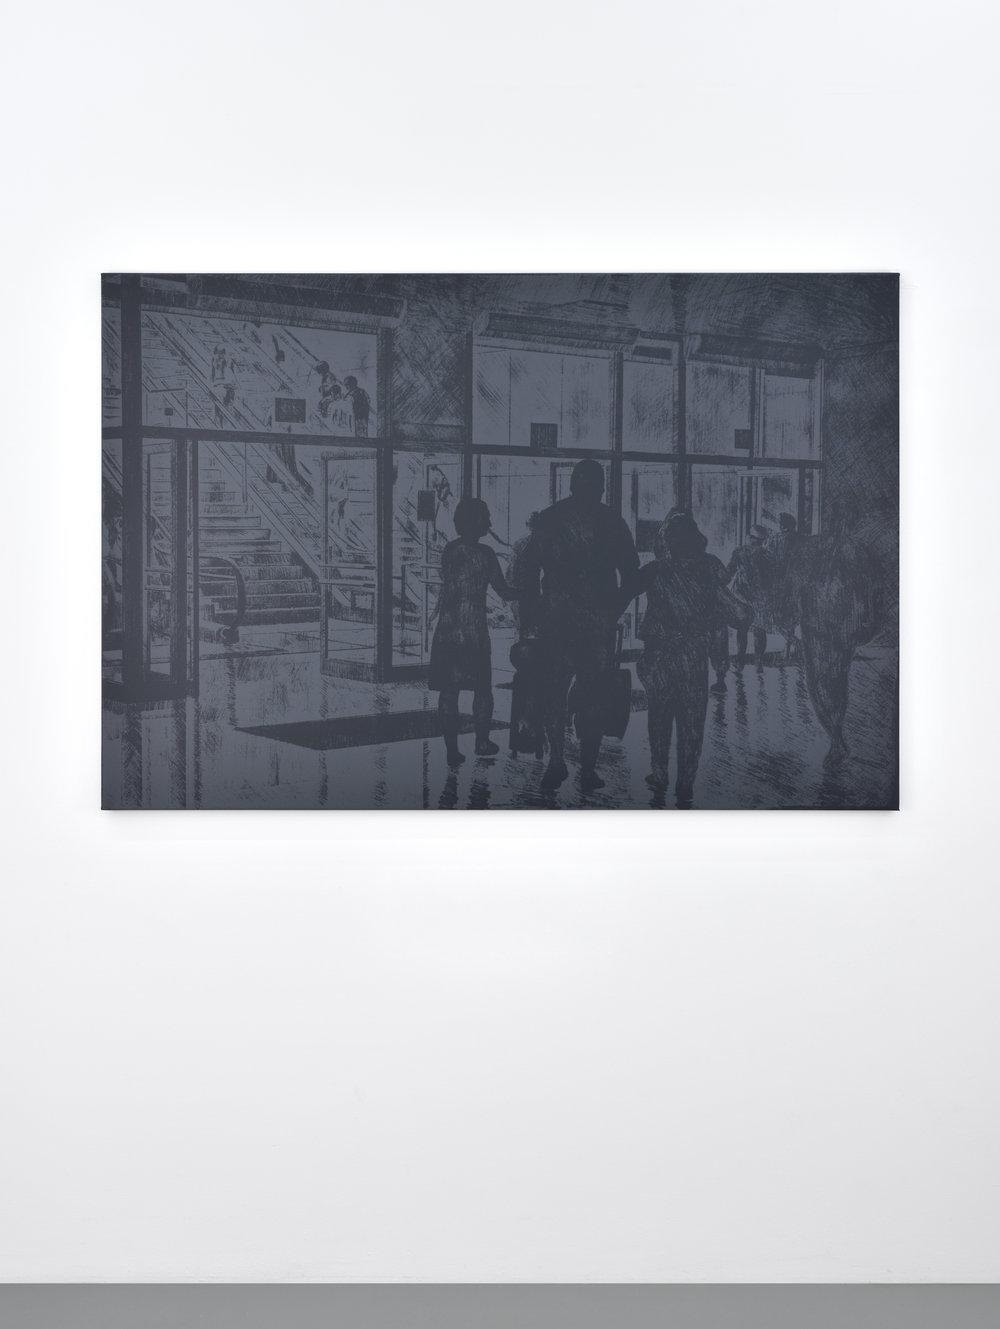 Untitled (escalator), 2017 silkscreen on canvas 106,7 x 158 cm - 42 x 62 1/4 inches